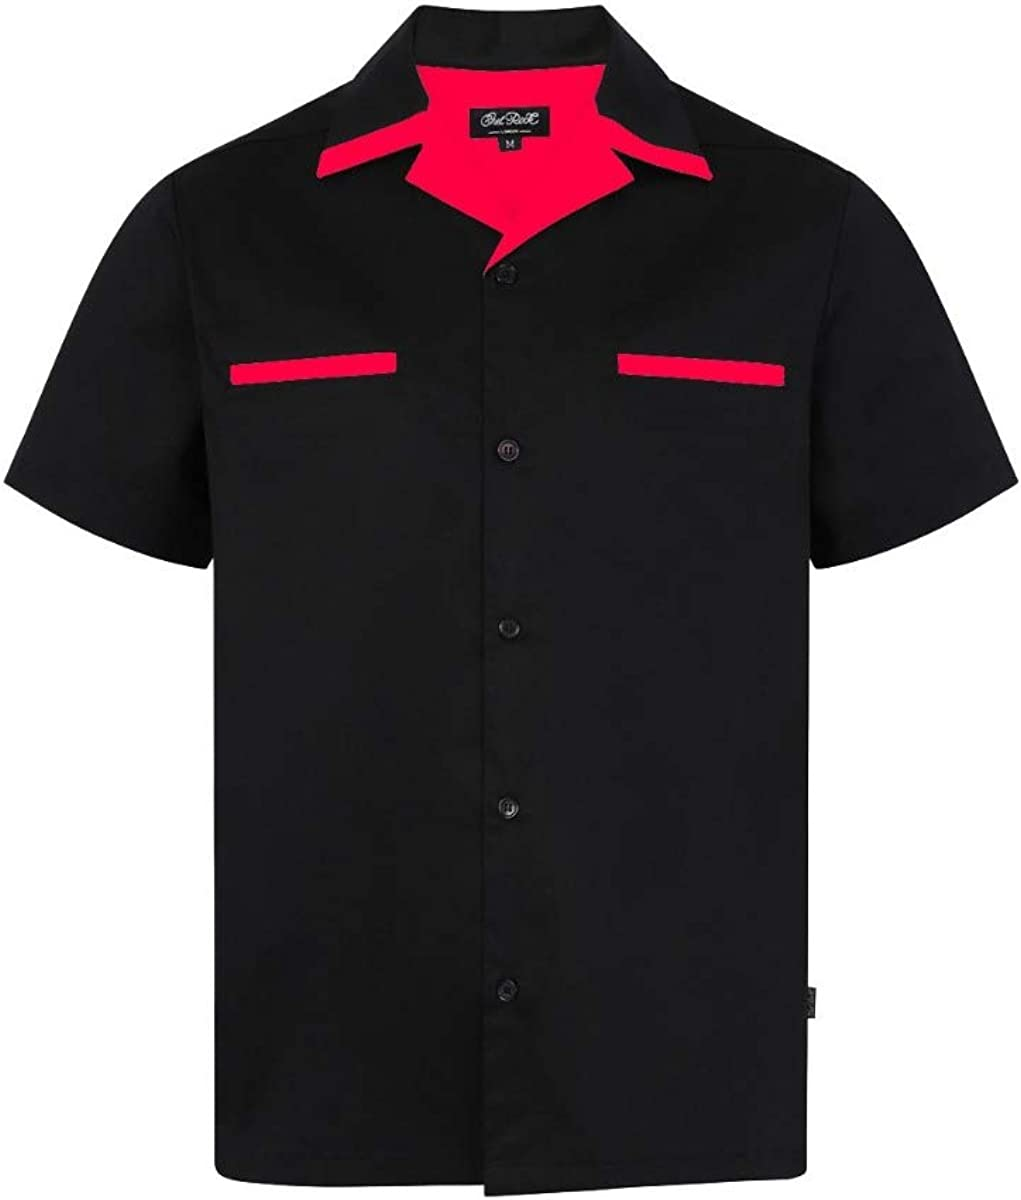 Chet Rock Donnie Bowling Shirt